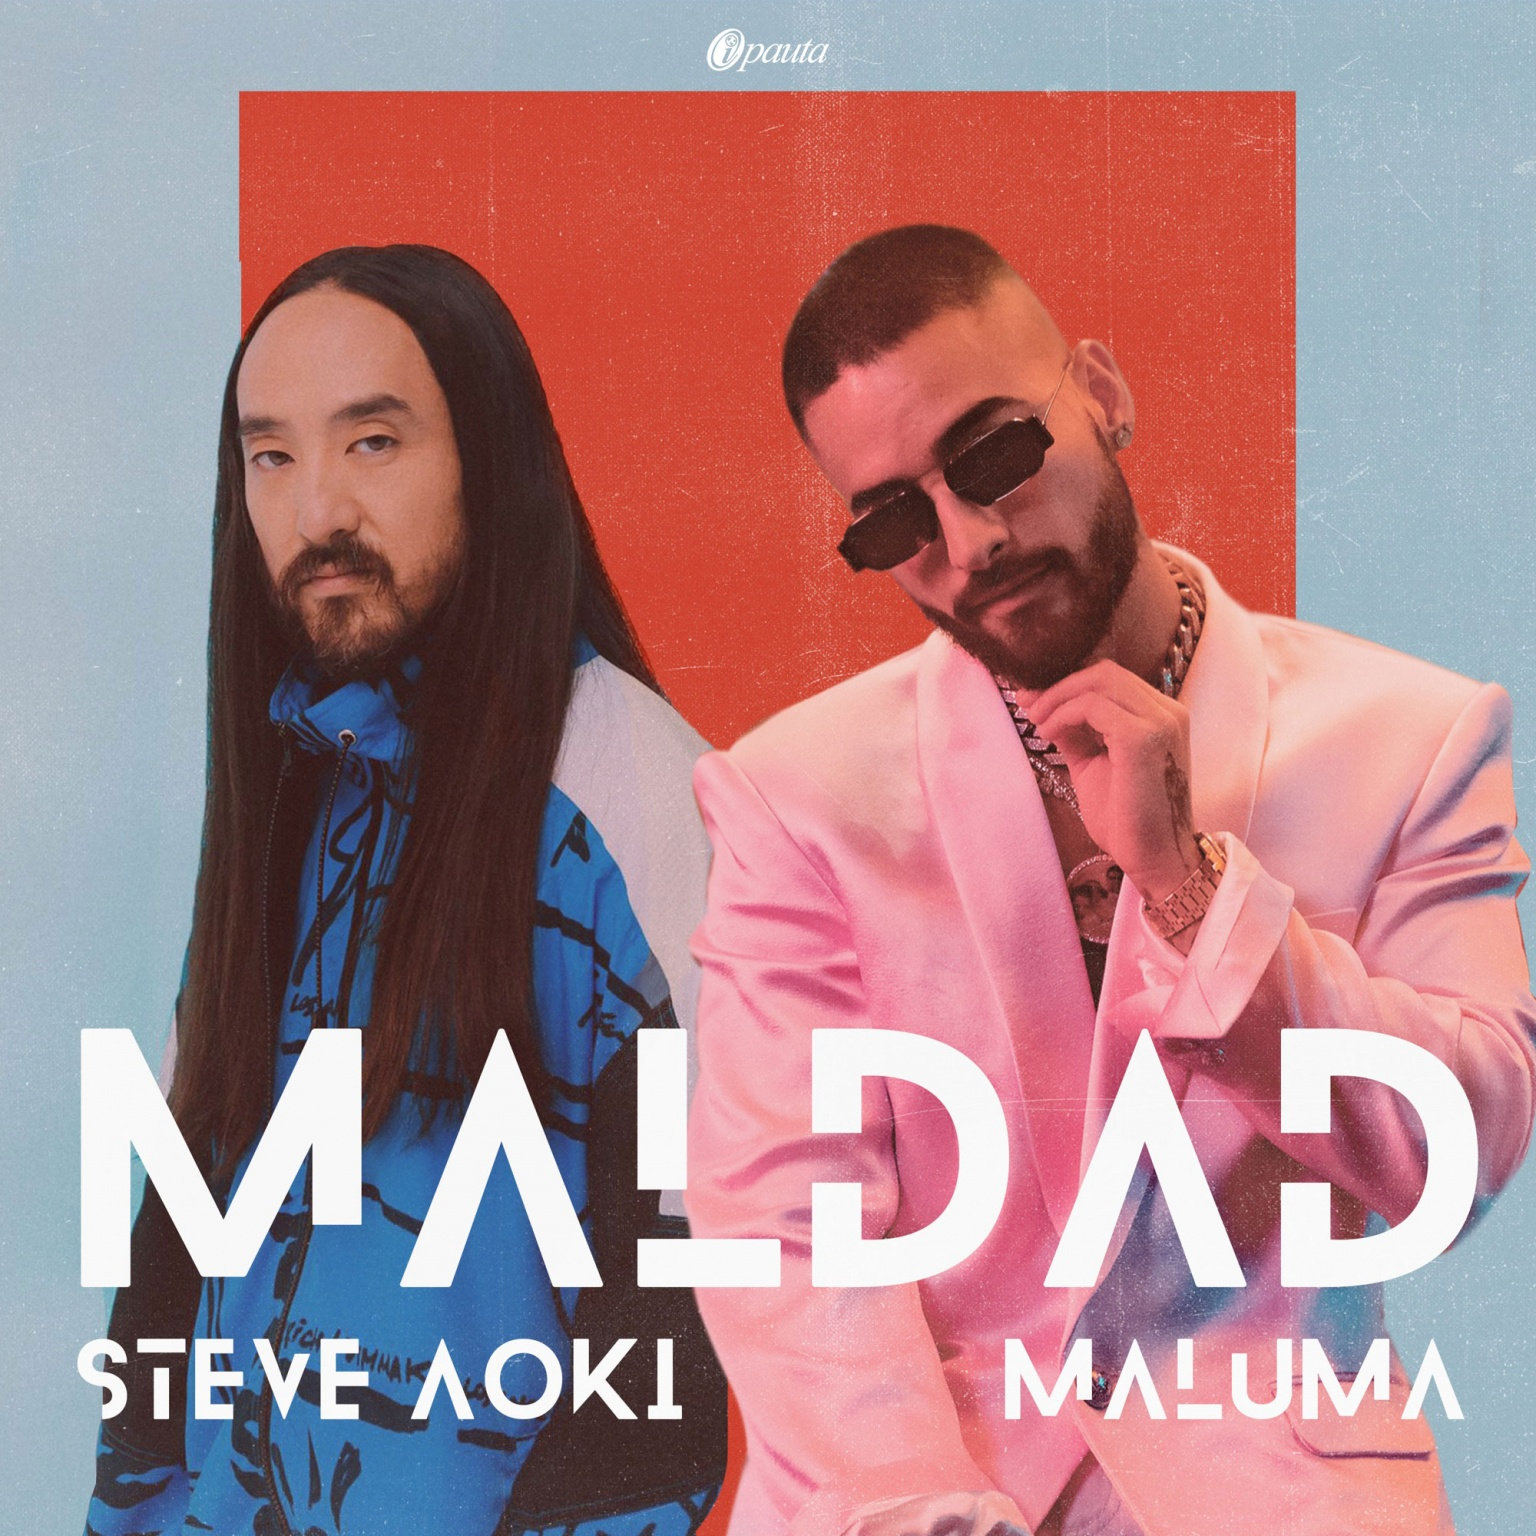 Steve Aoki Ft. Maluma - Maldad